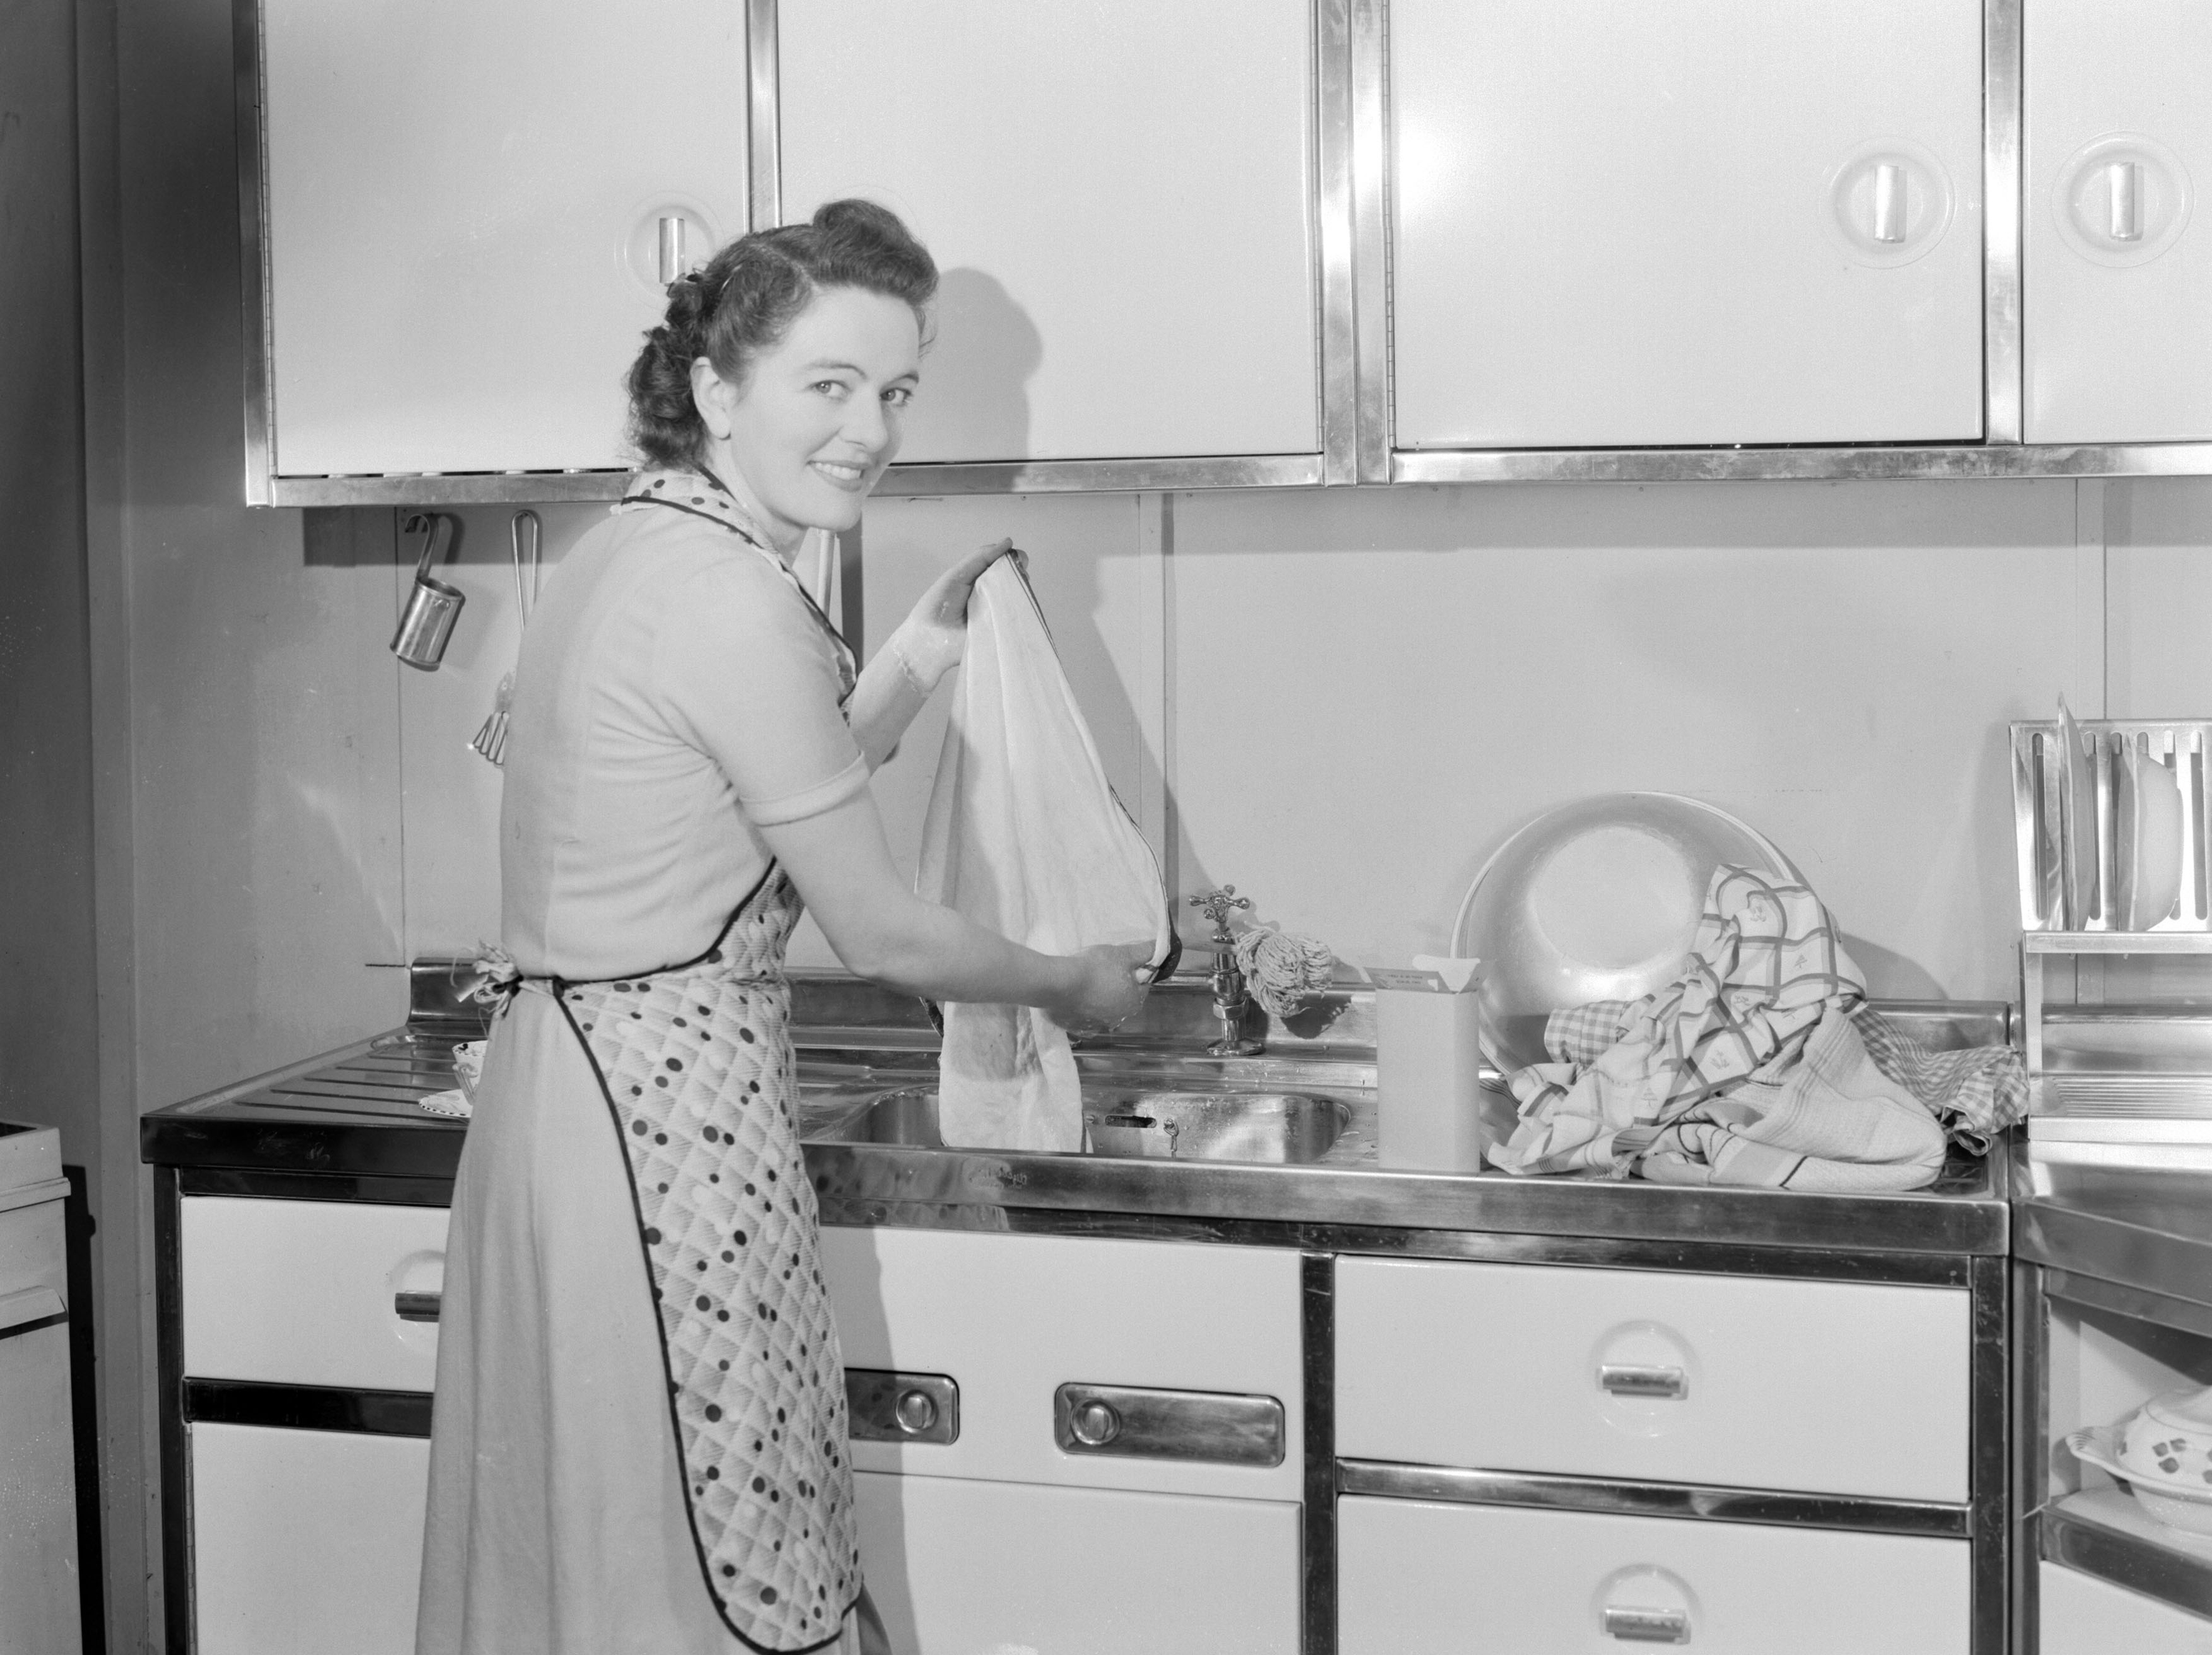 Woman washing cloths in a kitchen sink, 1950.